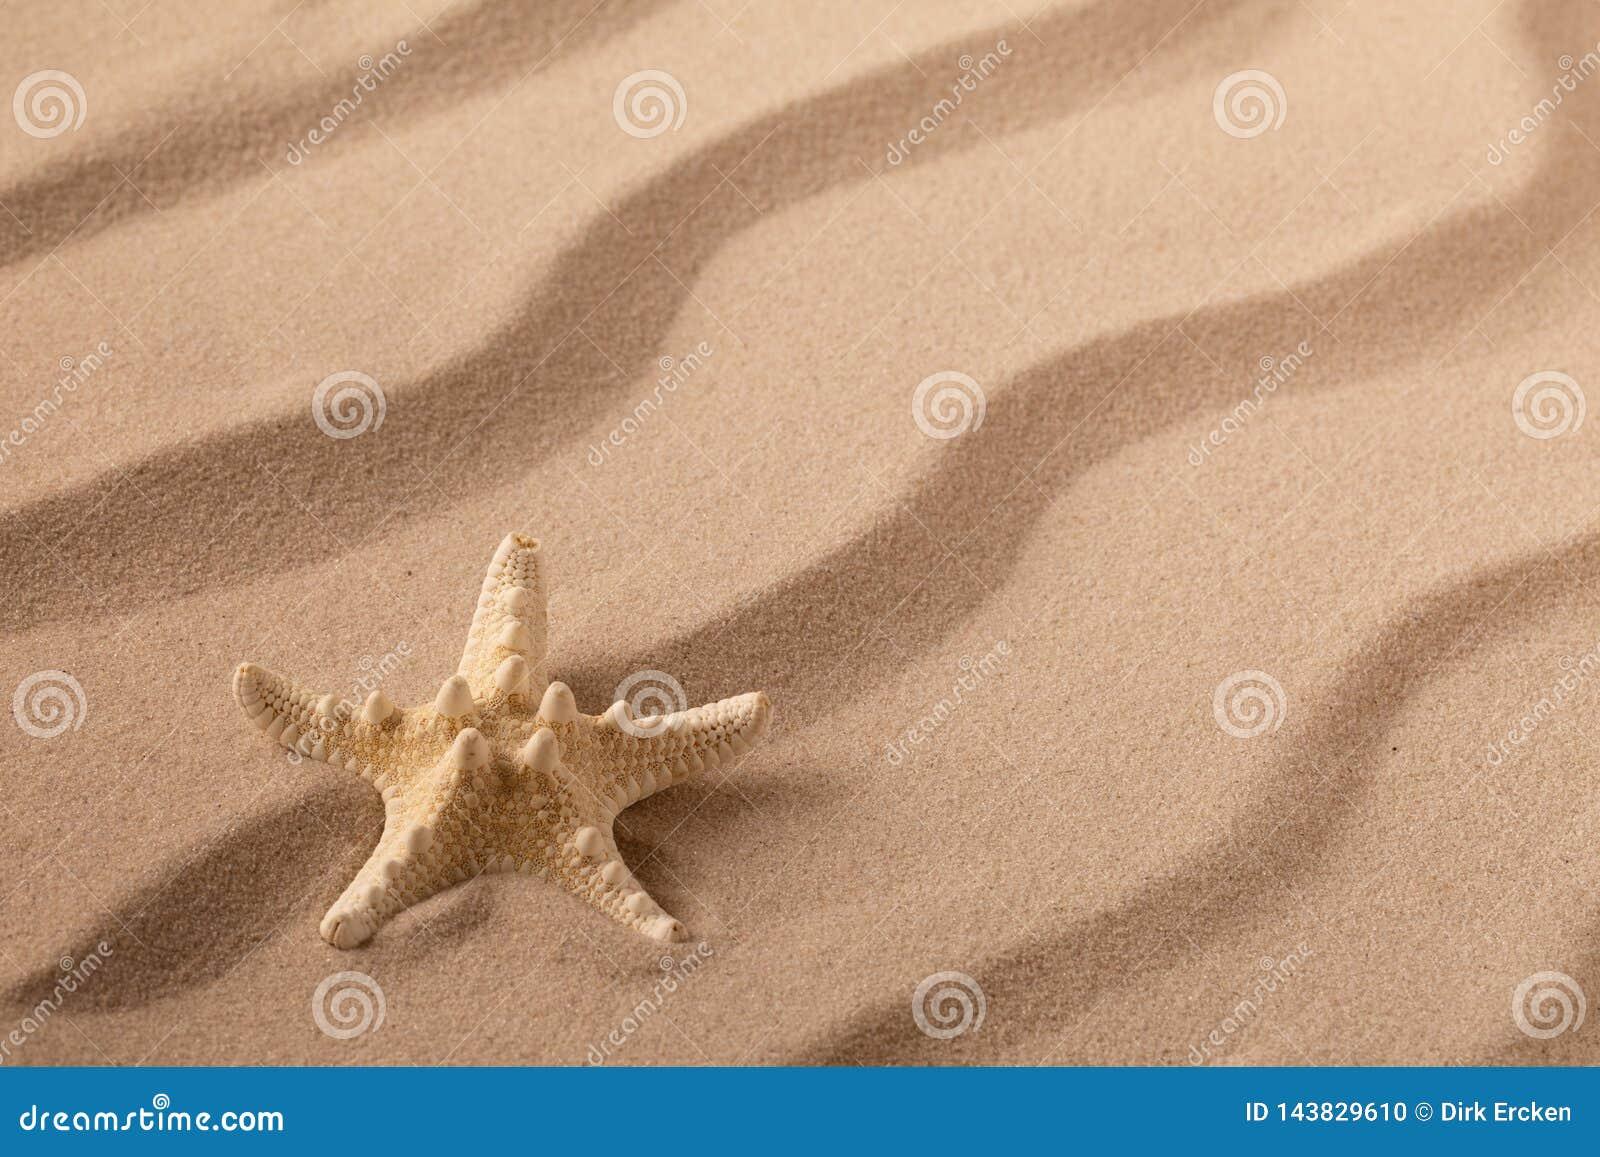 Seastar or starfish on rippled beach sand